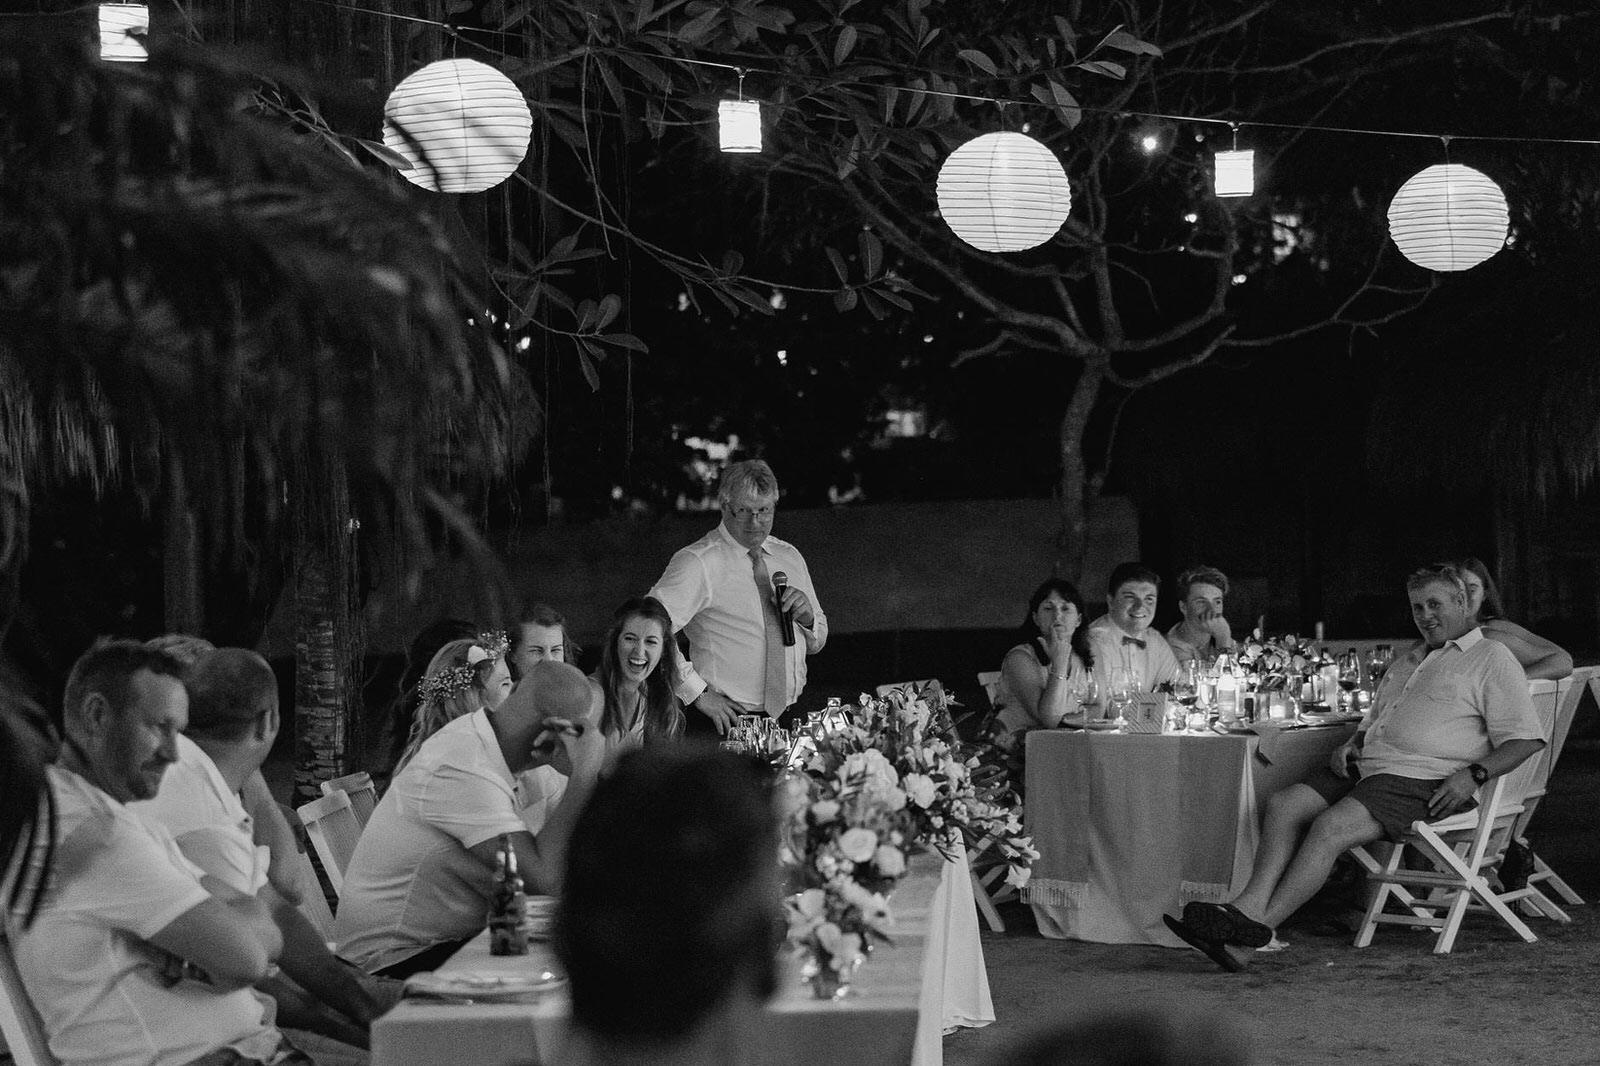 newfound-hai-tide-nusa-lembongan-bali-wedding-photographers-149